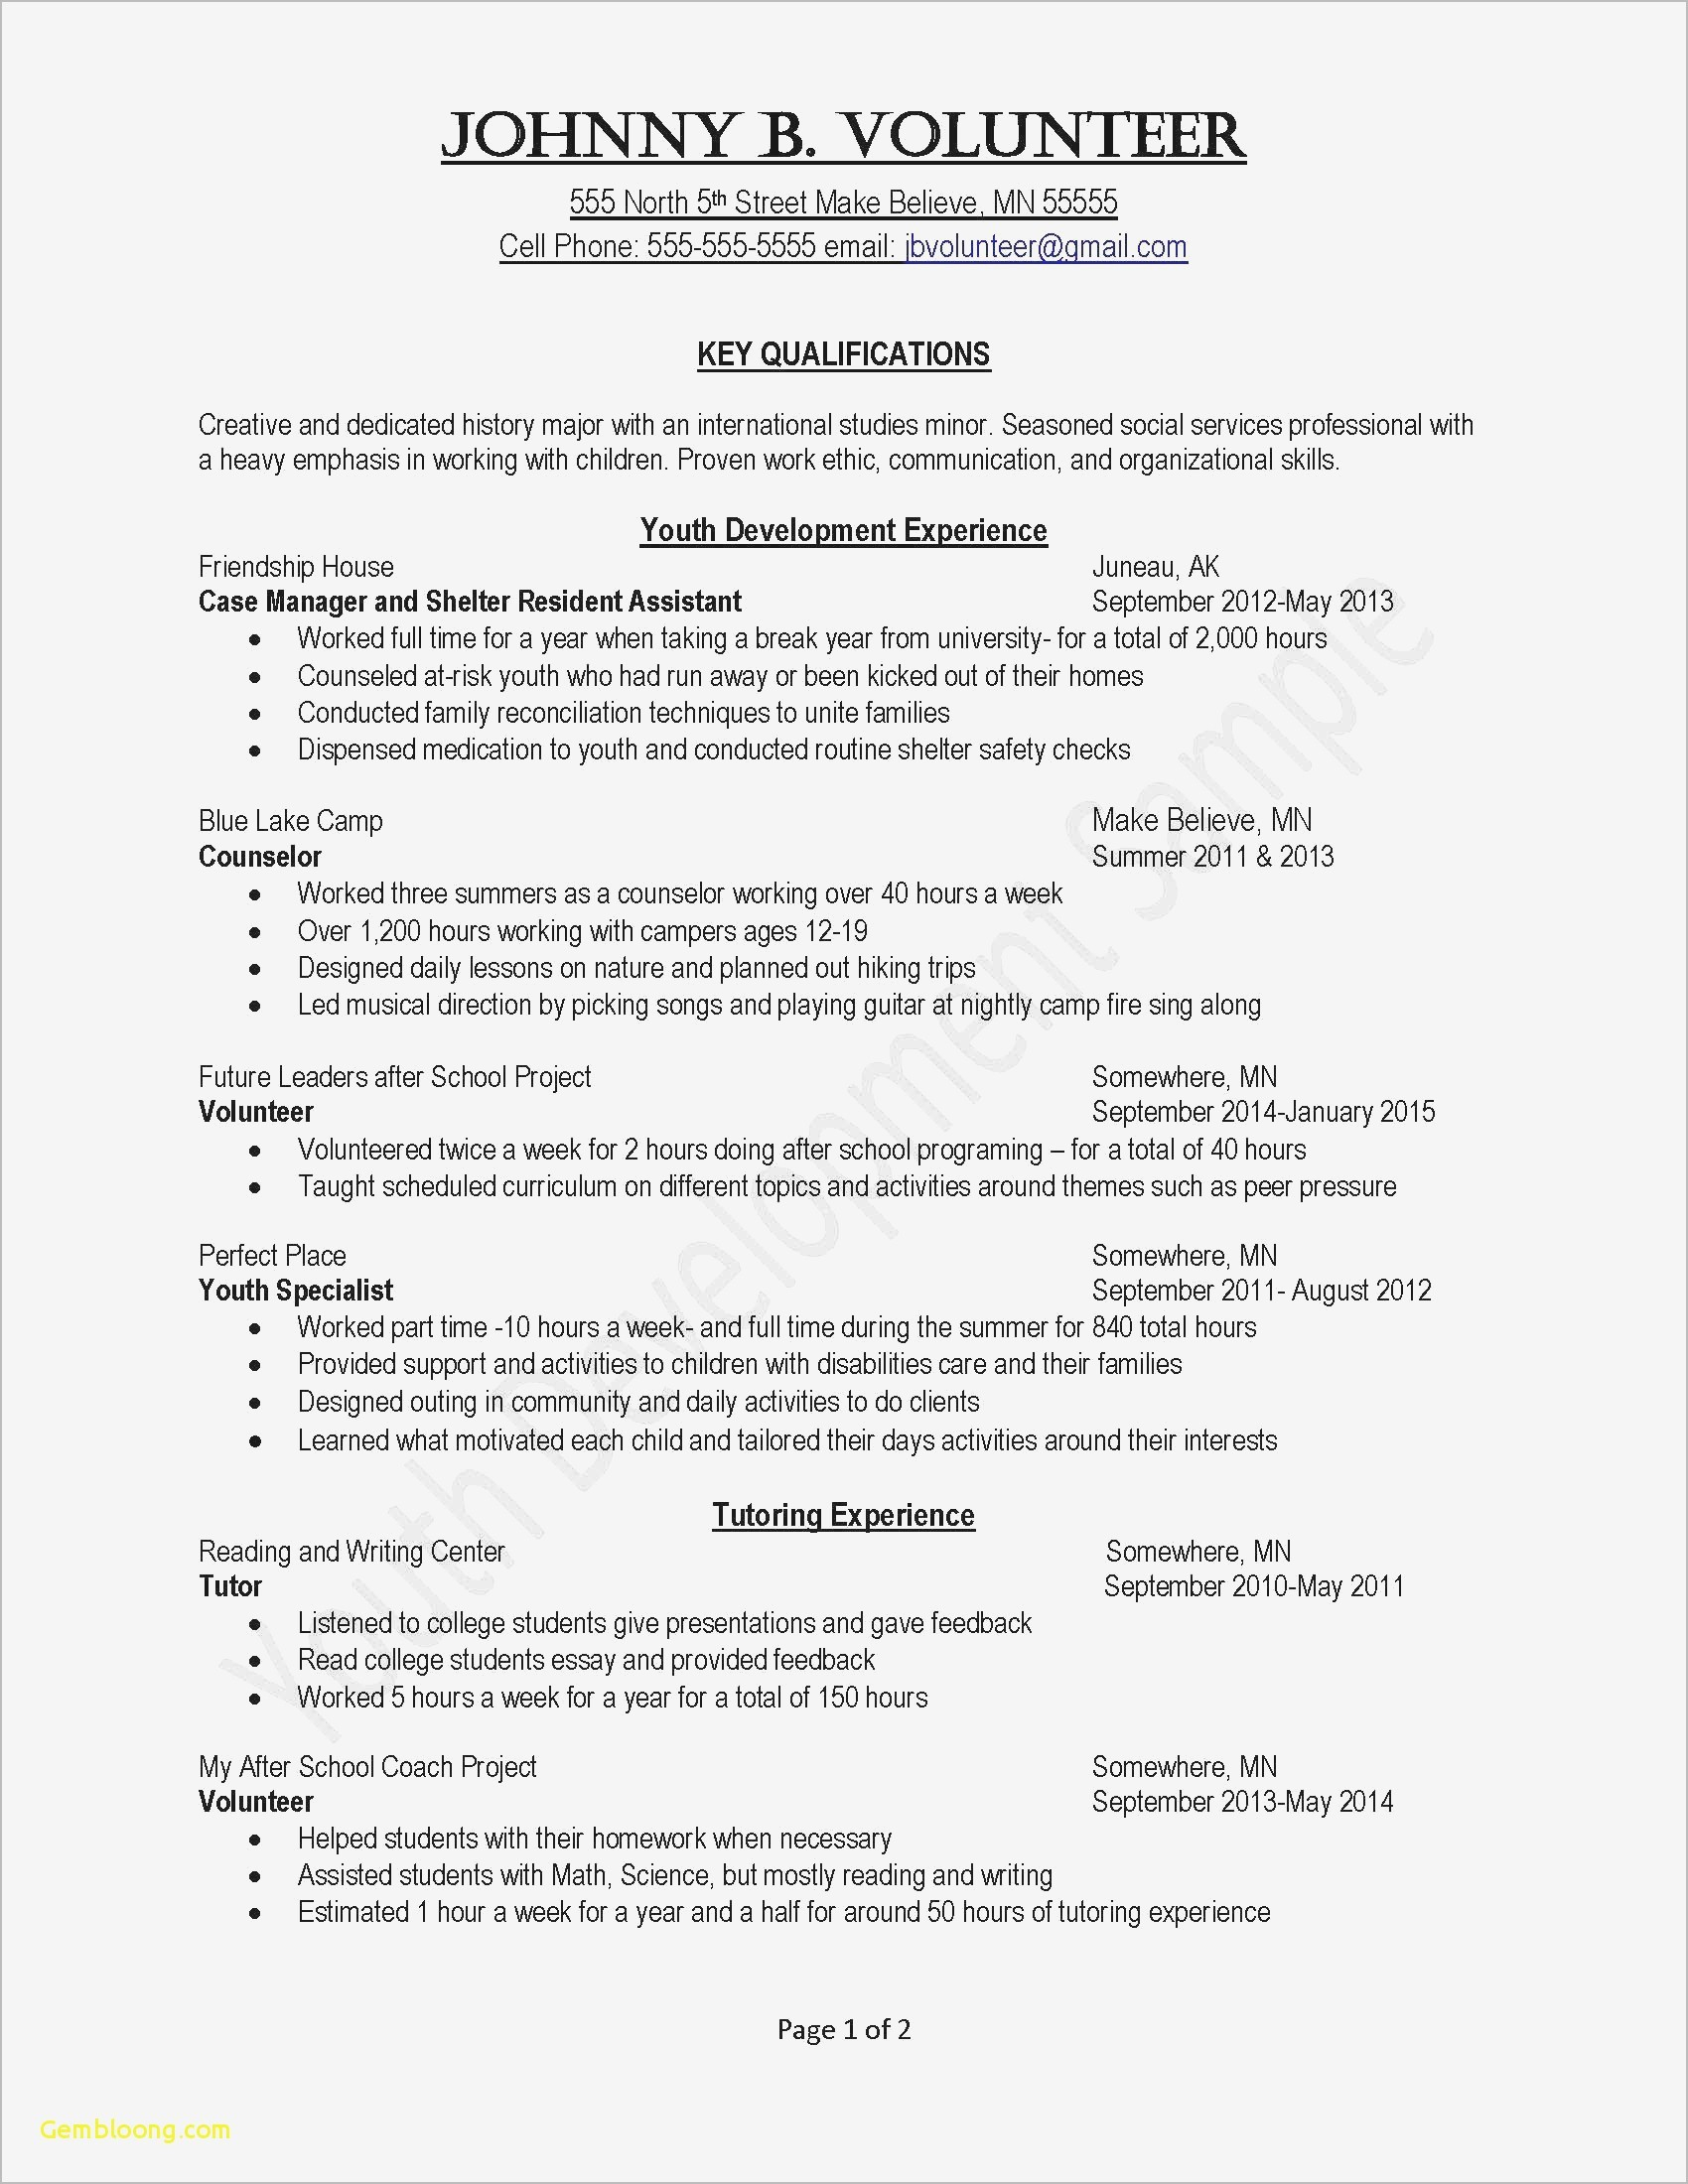 Job Application Cover Letter Template Word - Job Fer Letter Template Us Copy Od Consultant Cover Letter Fungram